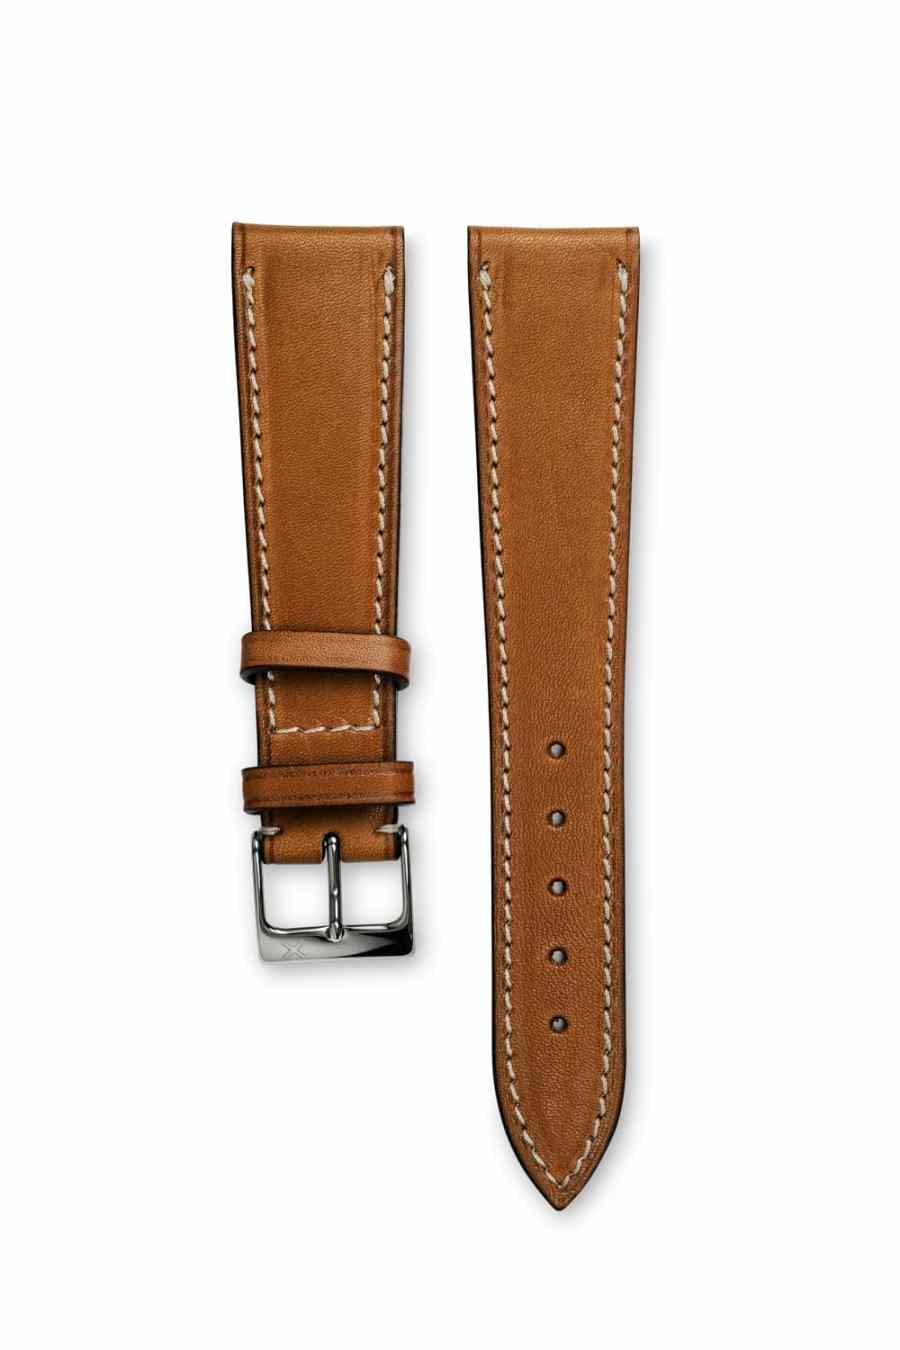 Smooth Classic Barenia light brown tan leather watch strap - cream stitching - LUGS brand